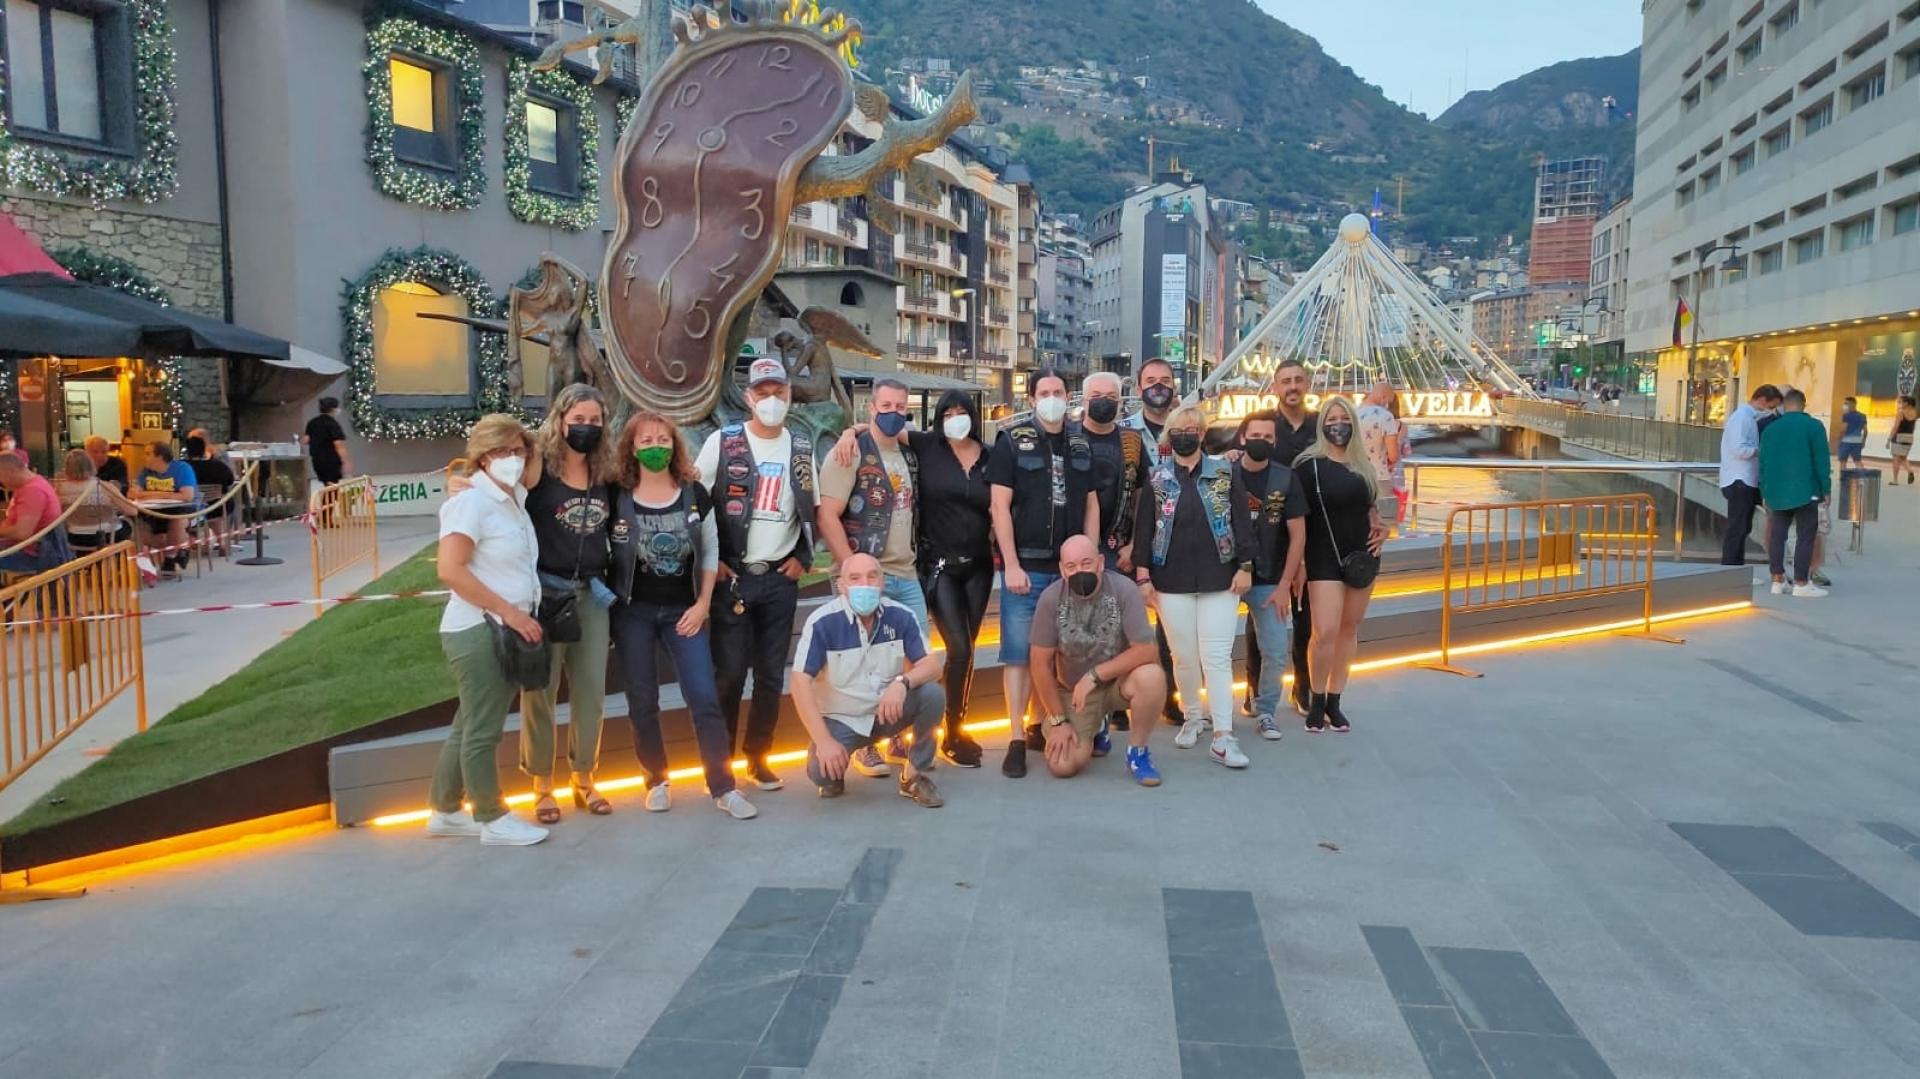 Asistentes al Custom Mountain Festival en Andorra